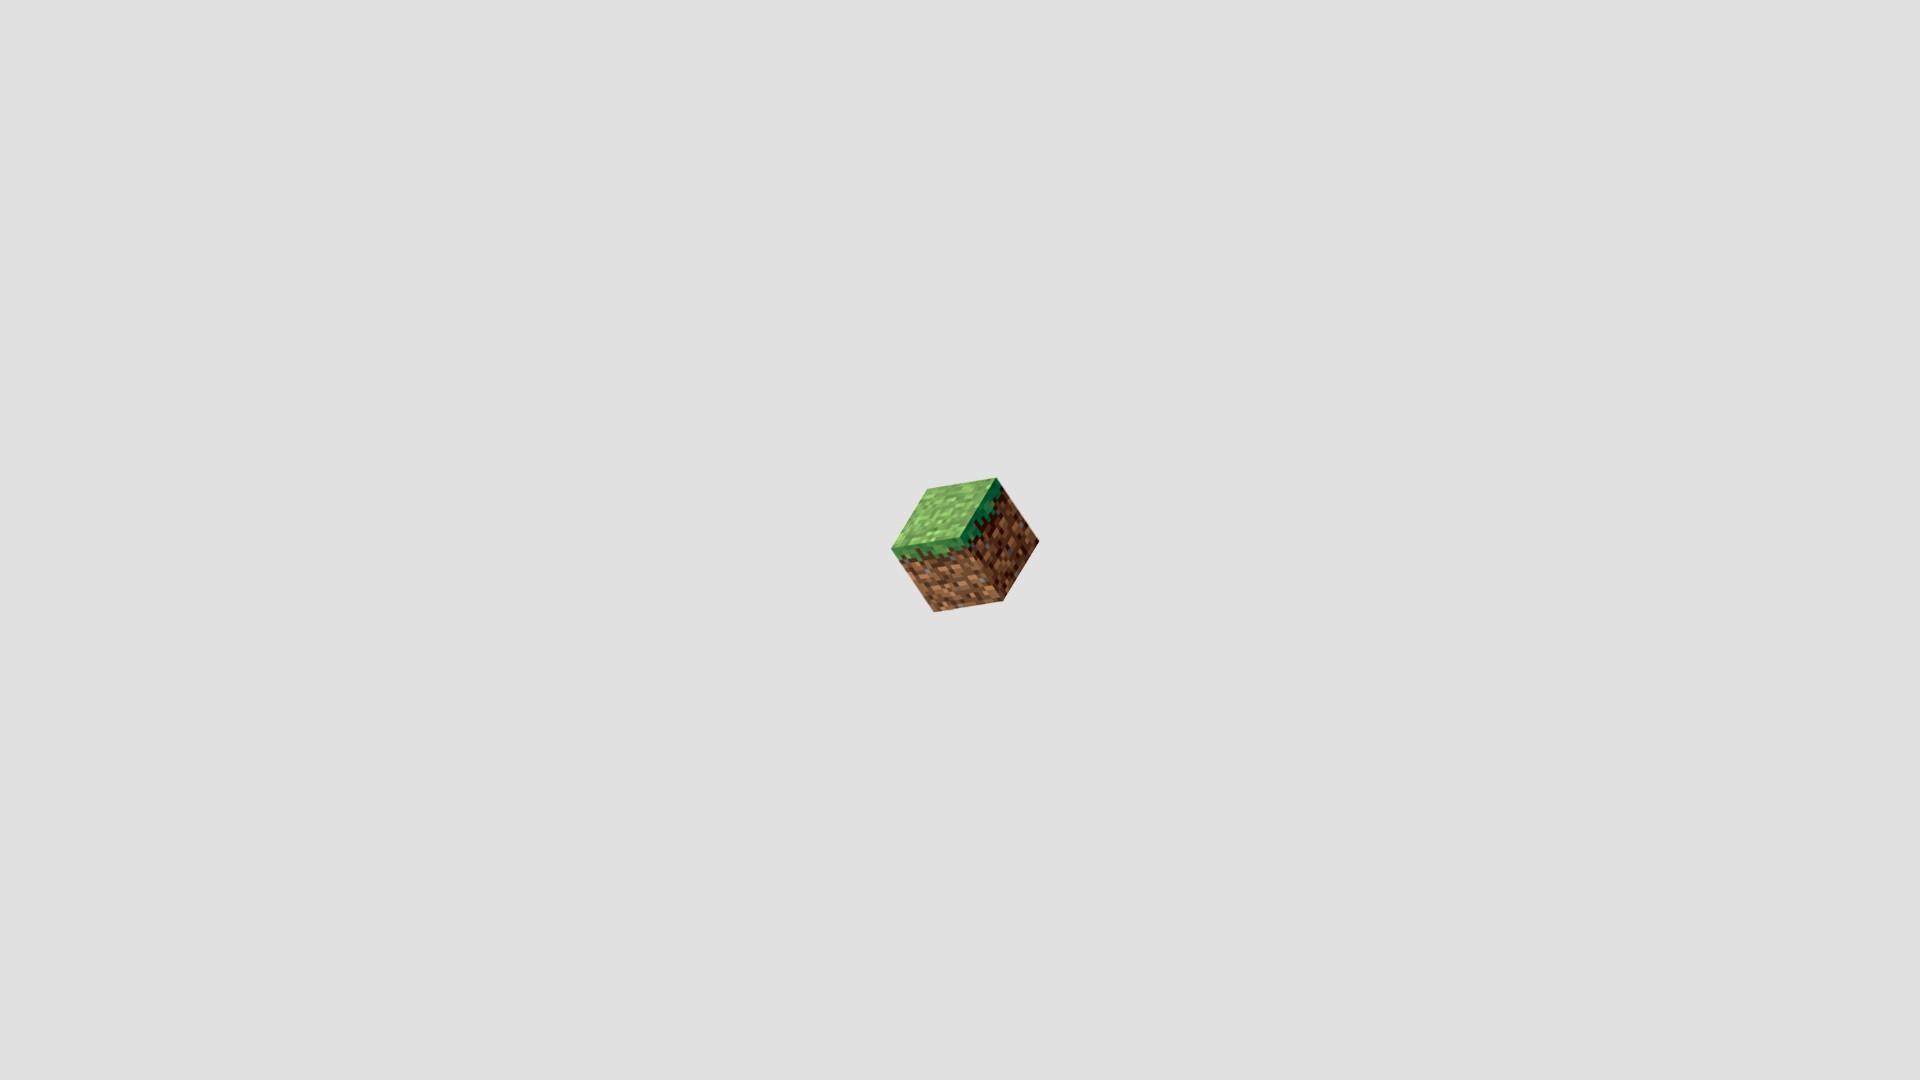 Fantastic Wallpaper Minecraft Minimalistic - minecraft-minimalism-wallpaper  Picture_894020.jpg